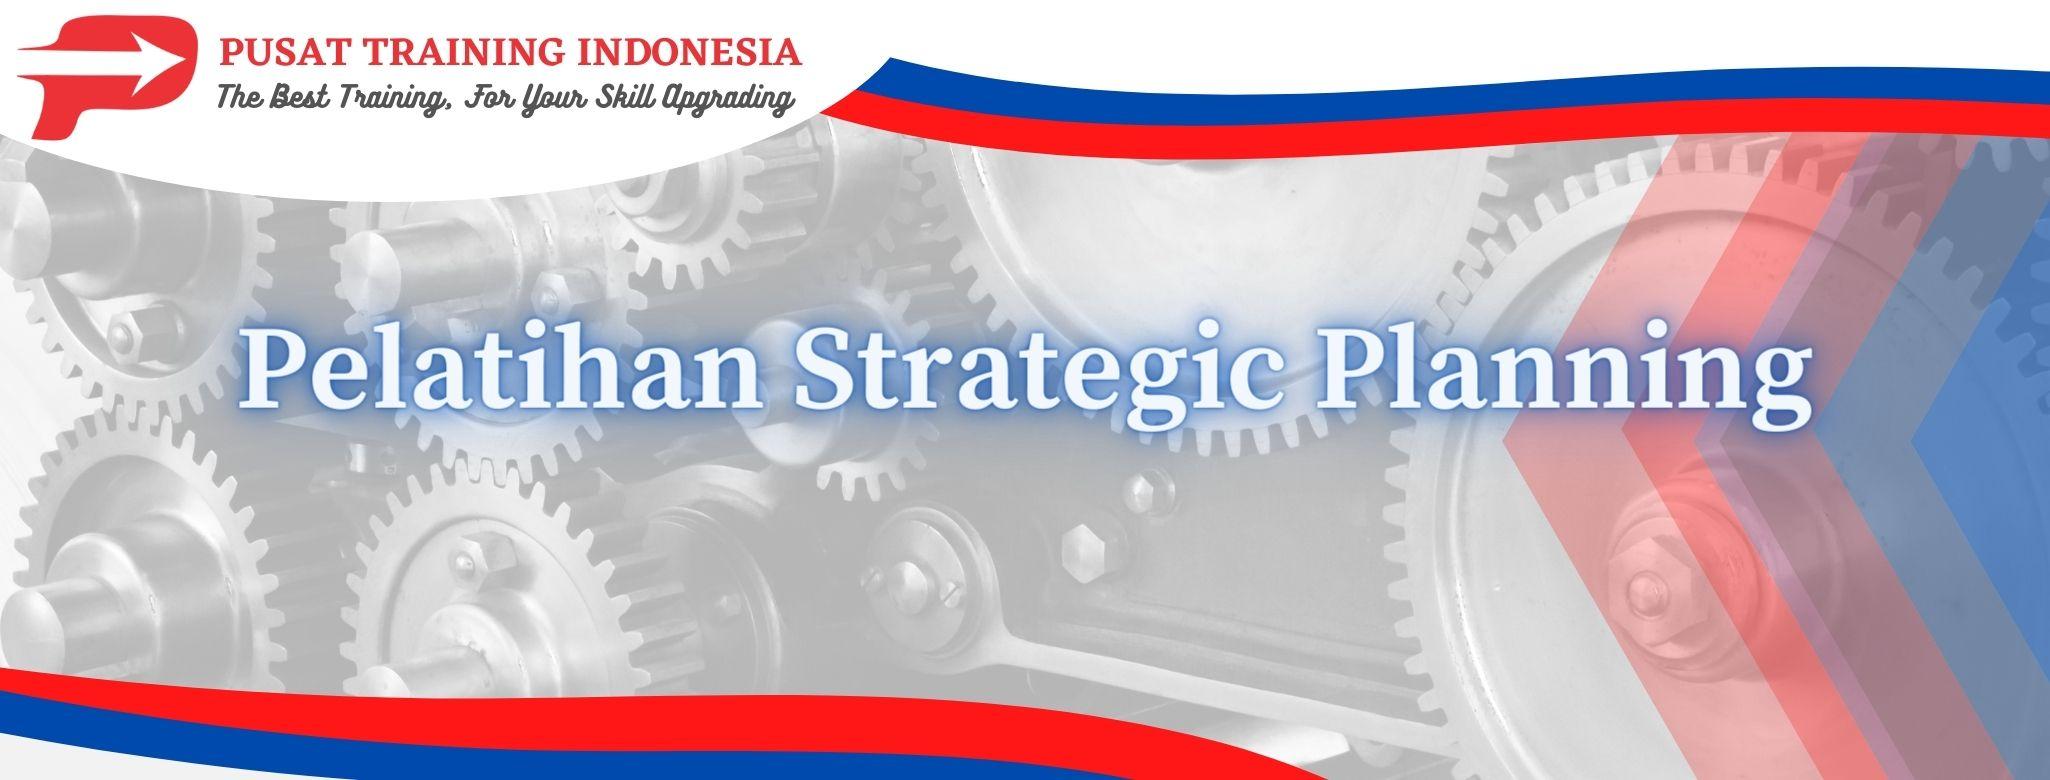 Pelatihan-Strategic-Planning